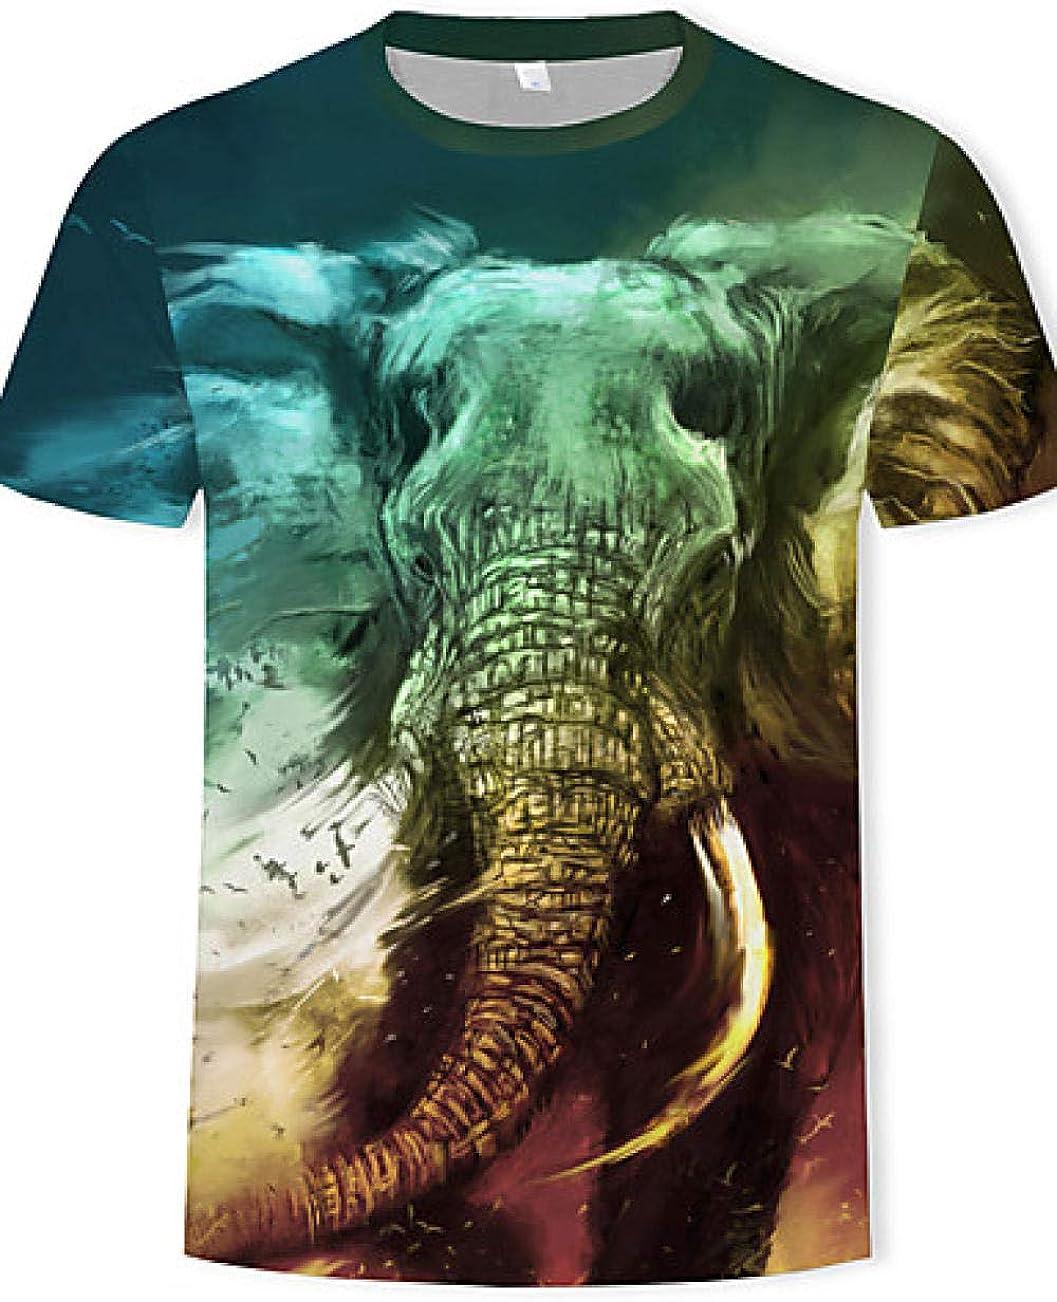 Camiseta de algodón de Talla Grande para Hombre - 3D / Animal Print Round Neck Green XXXL @ Green_XXXL: Amazon.es: Ropa y accesorios